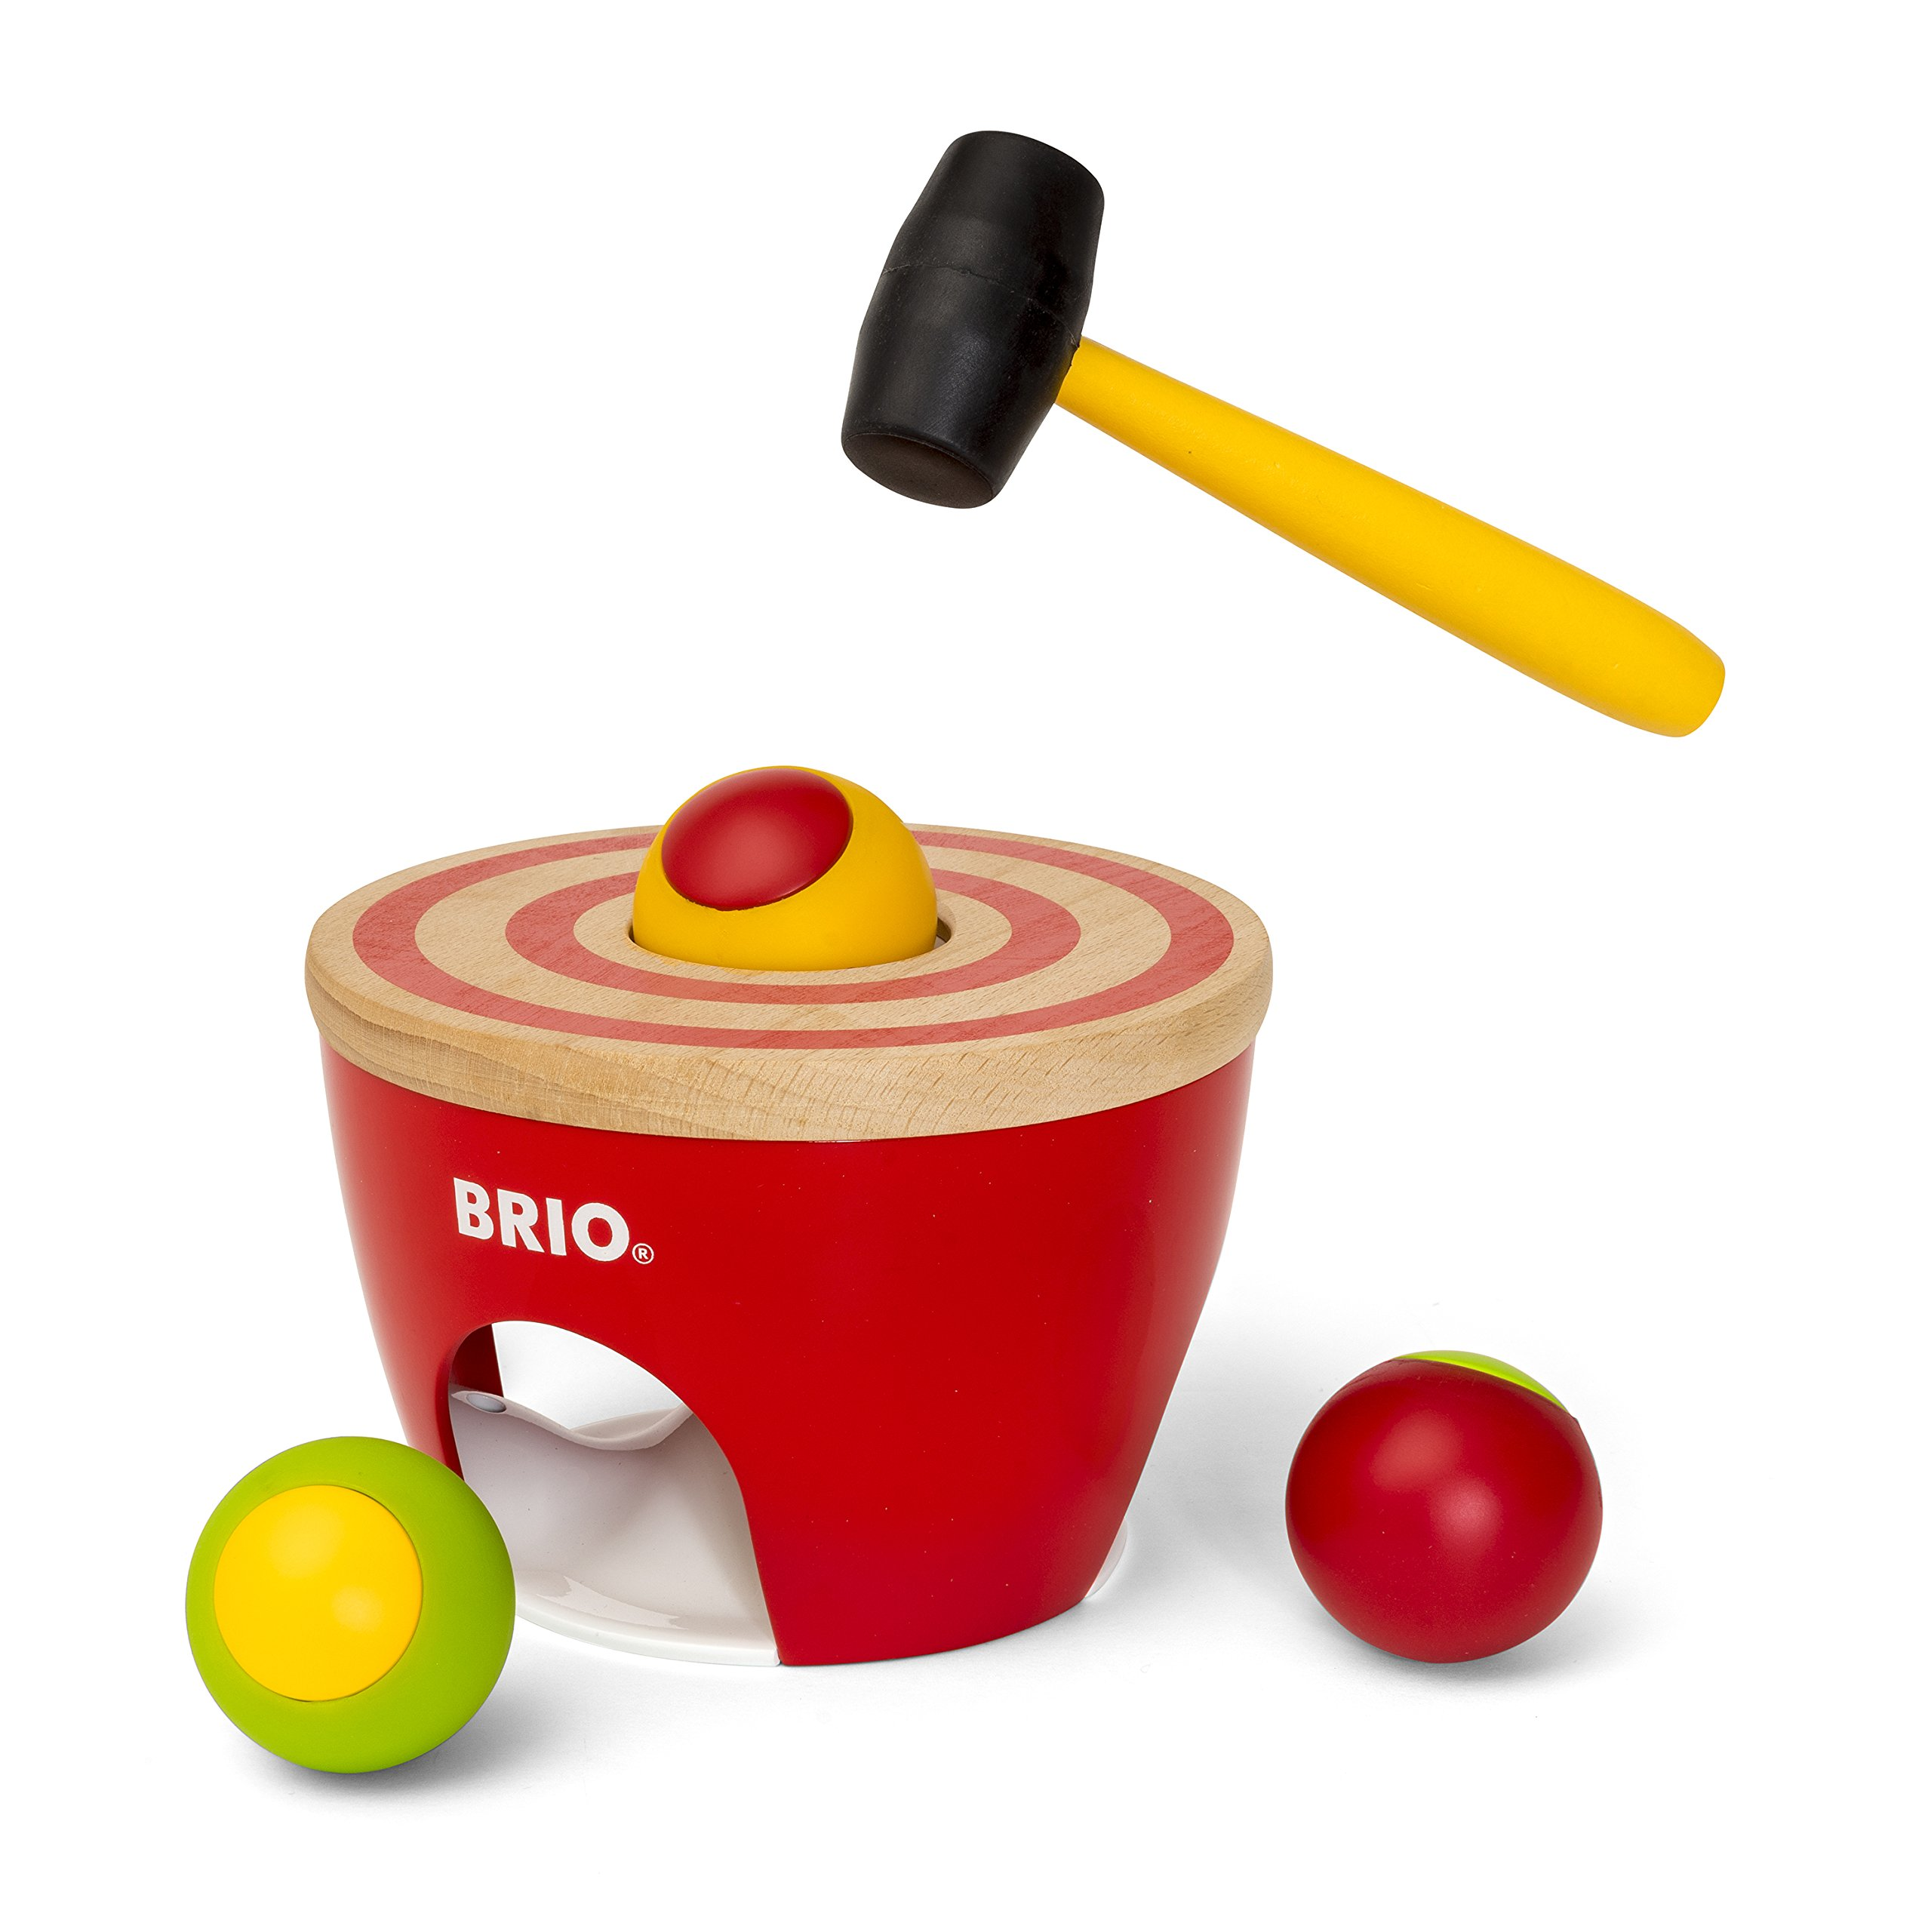 Brio Infant & Toddler - Ball Pounder